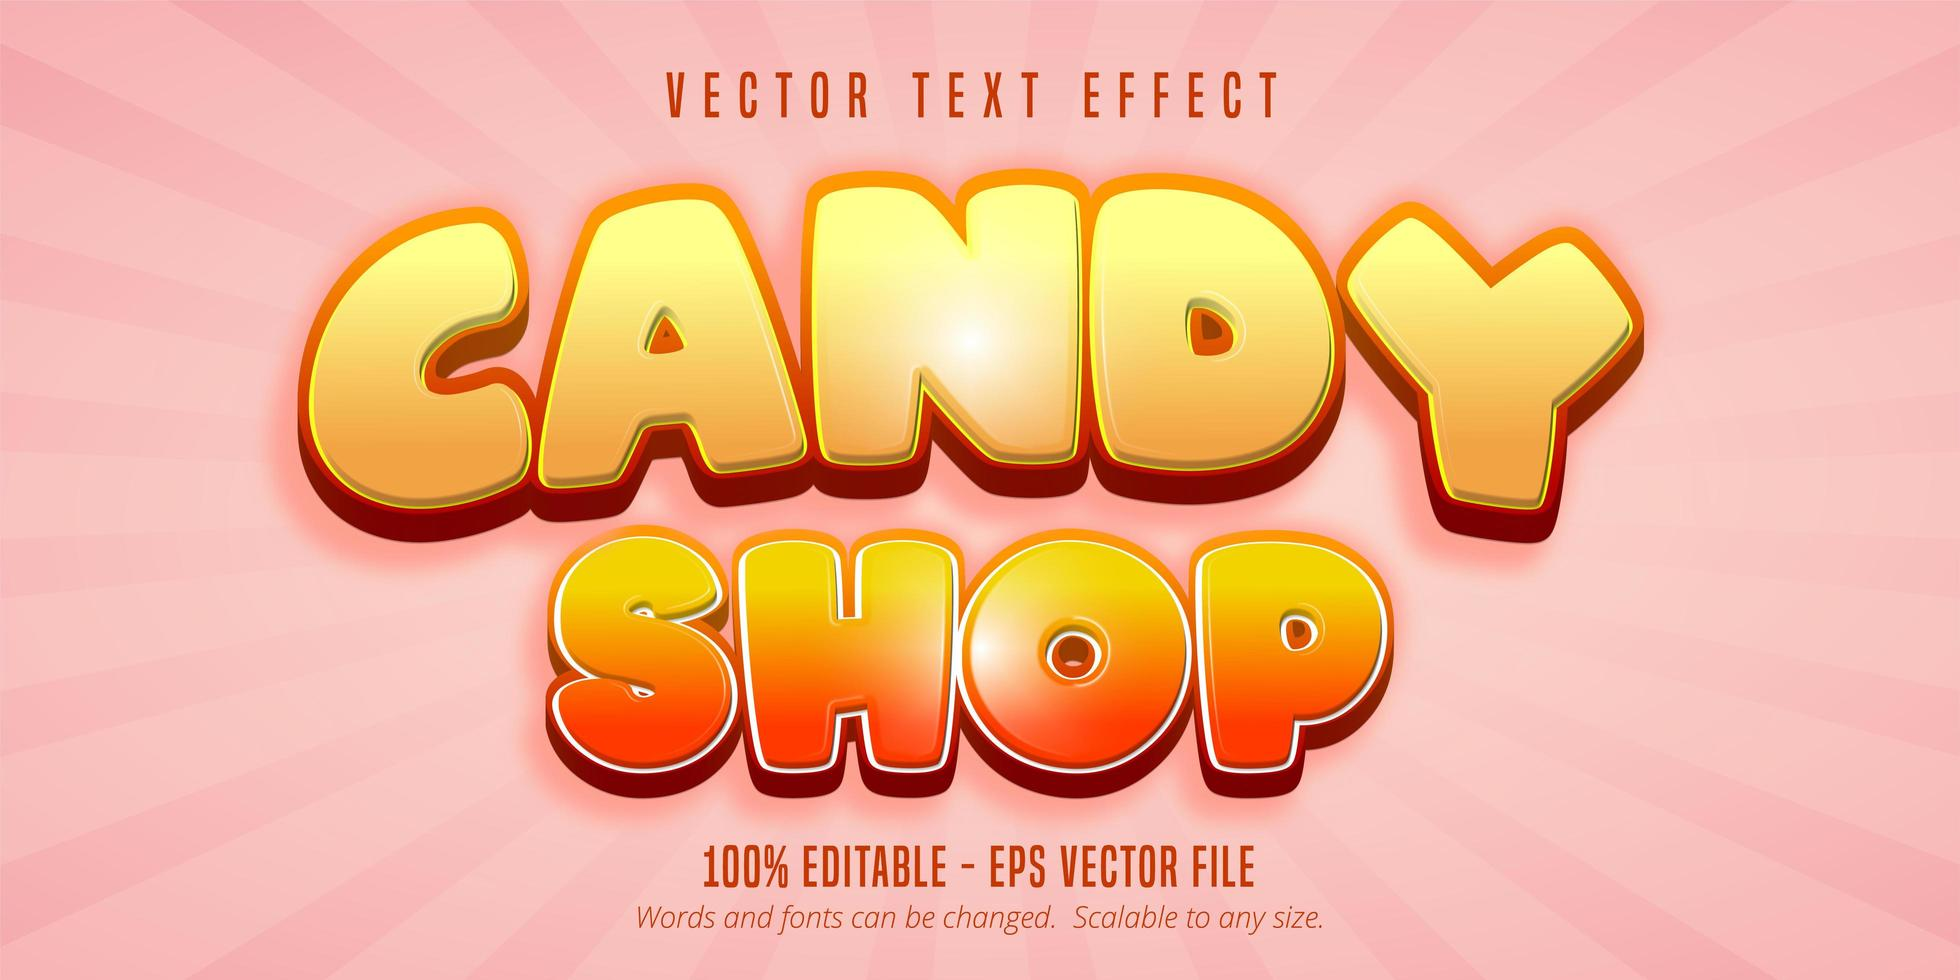 Candy shop text vector